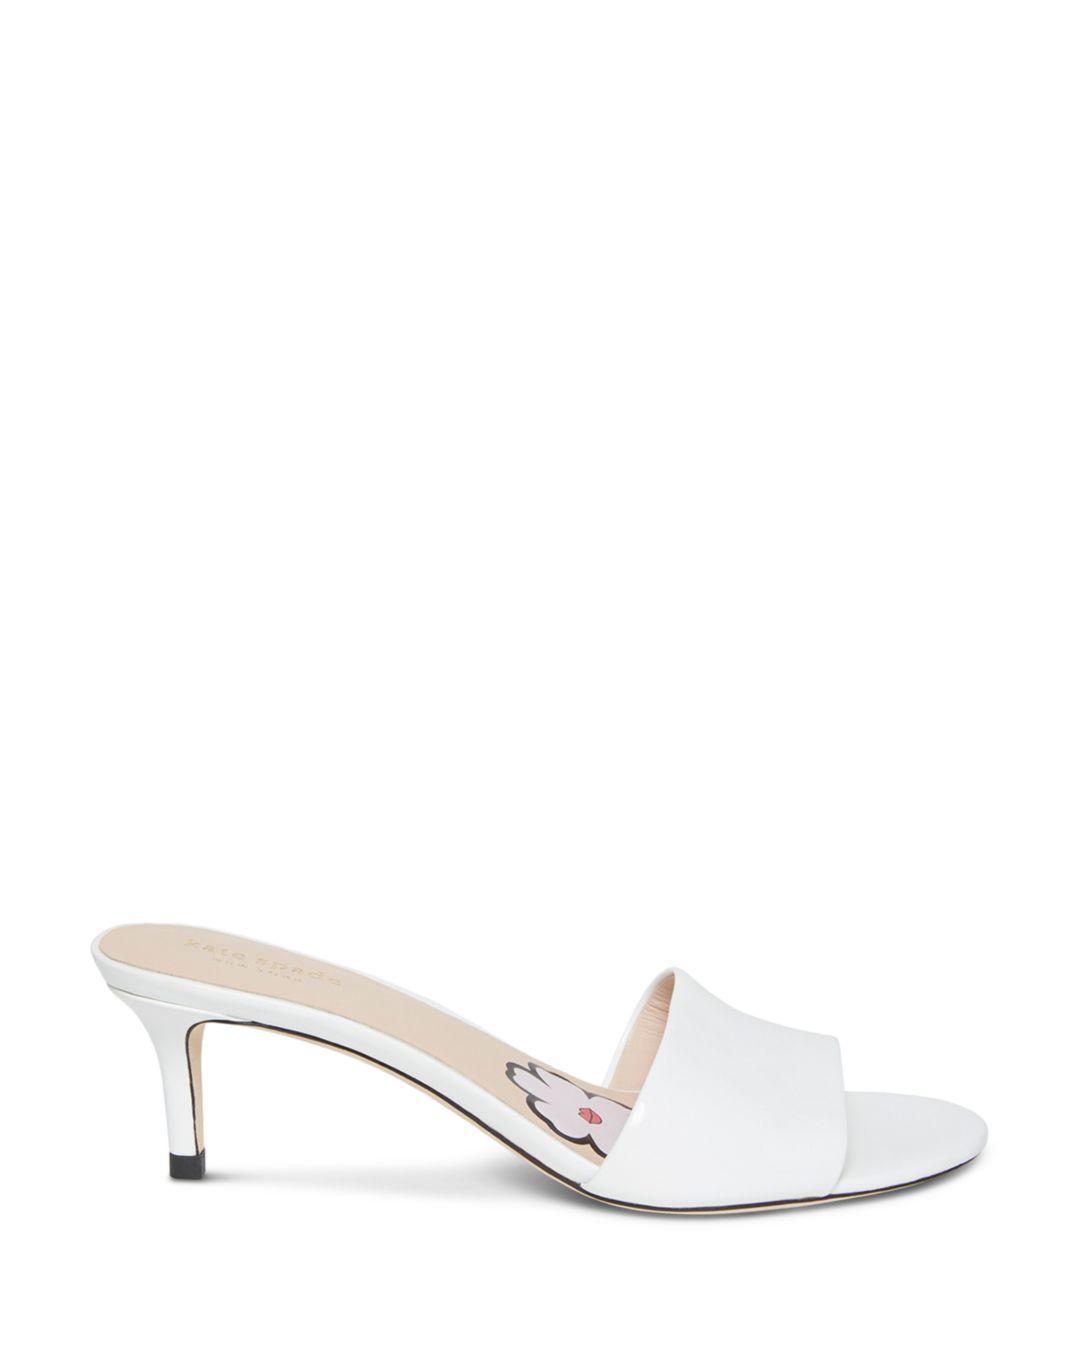 8e934a421 Tap to visit site. Kate Spade - White Women's Savvi Kitten Heel Slide  Sandals ...